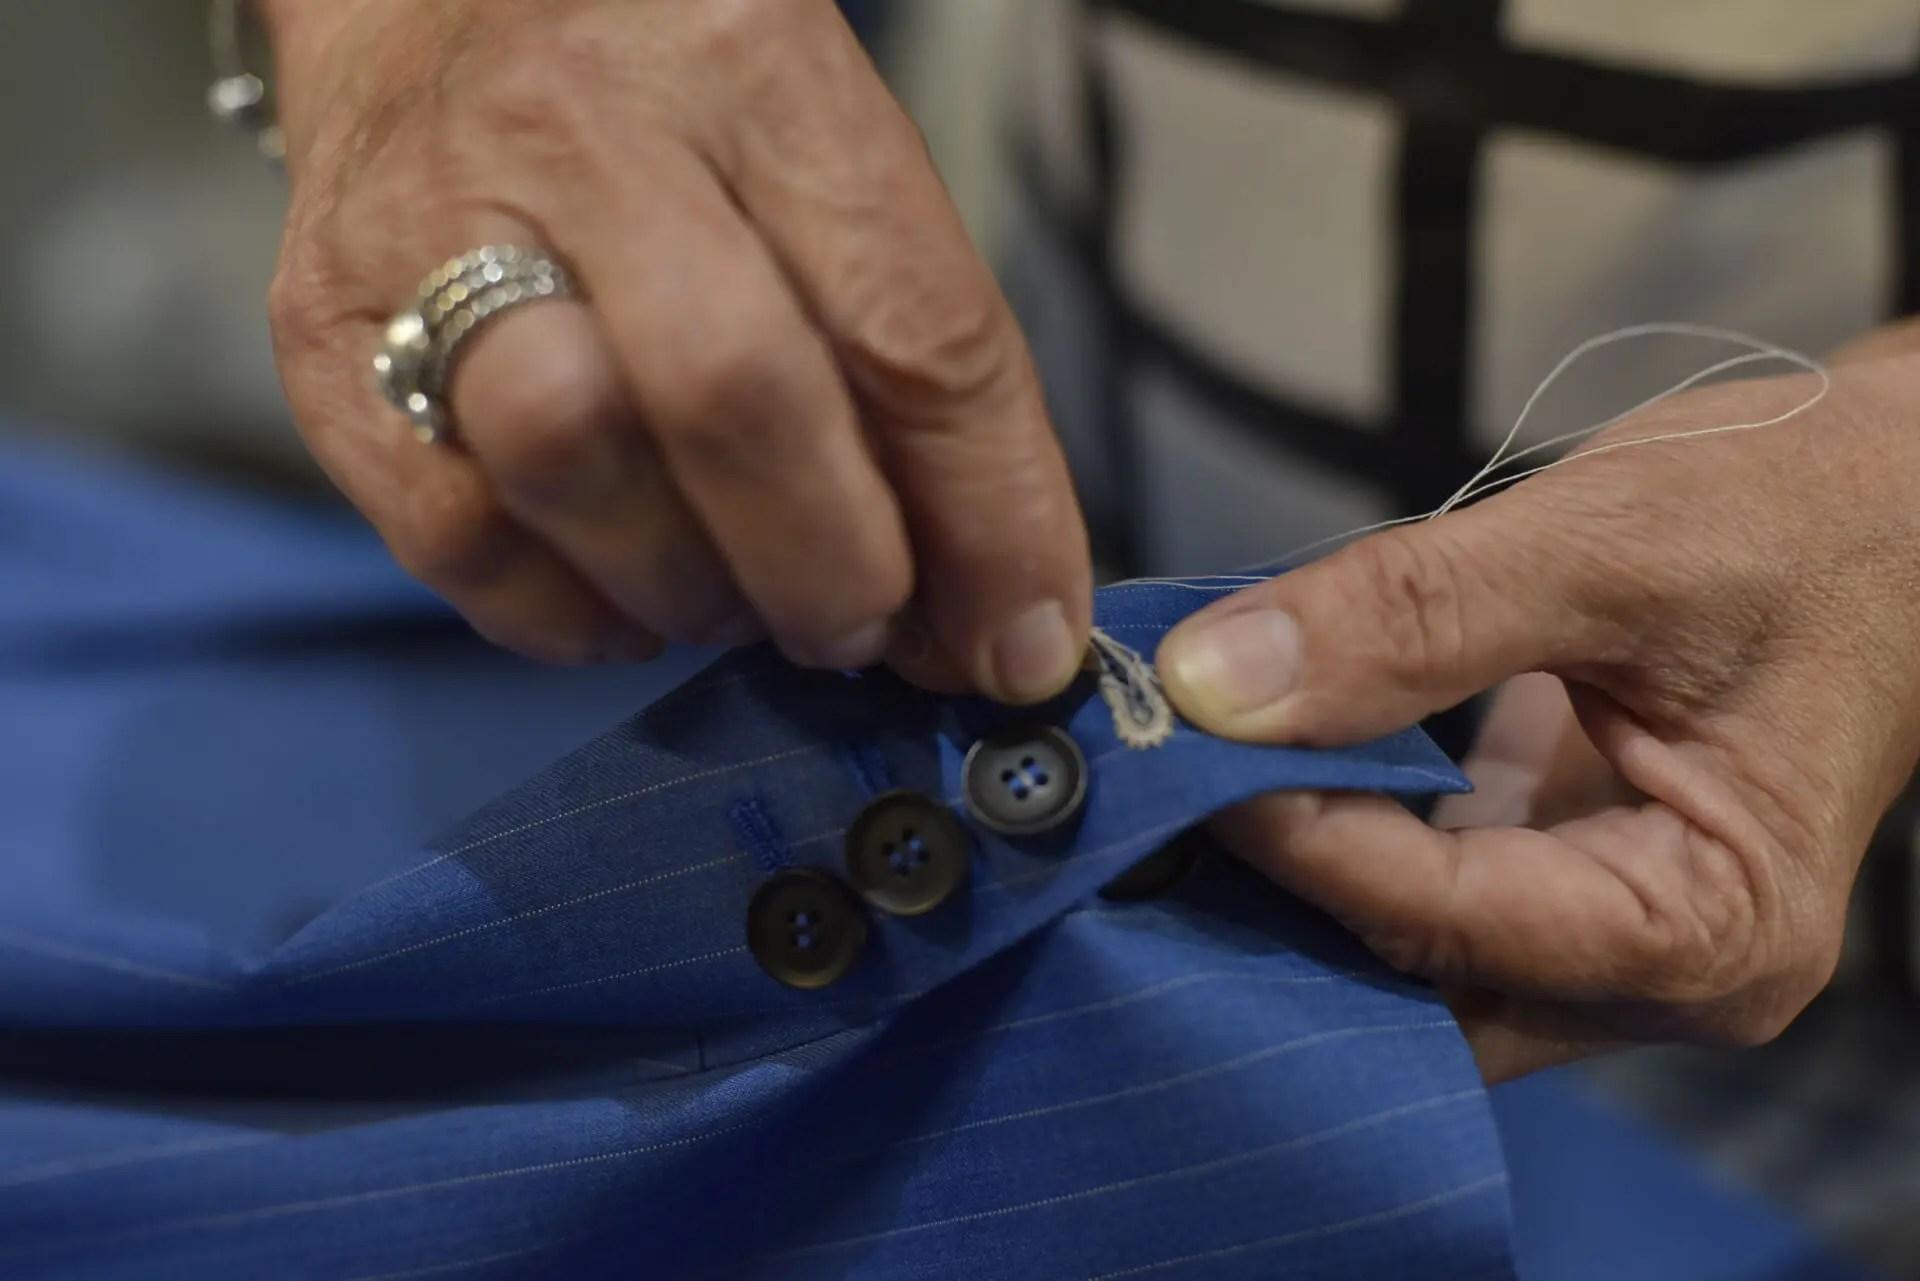 Jaxson Maximus Miami Tailoring and Alterations